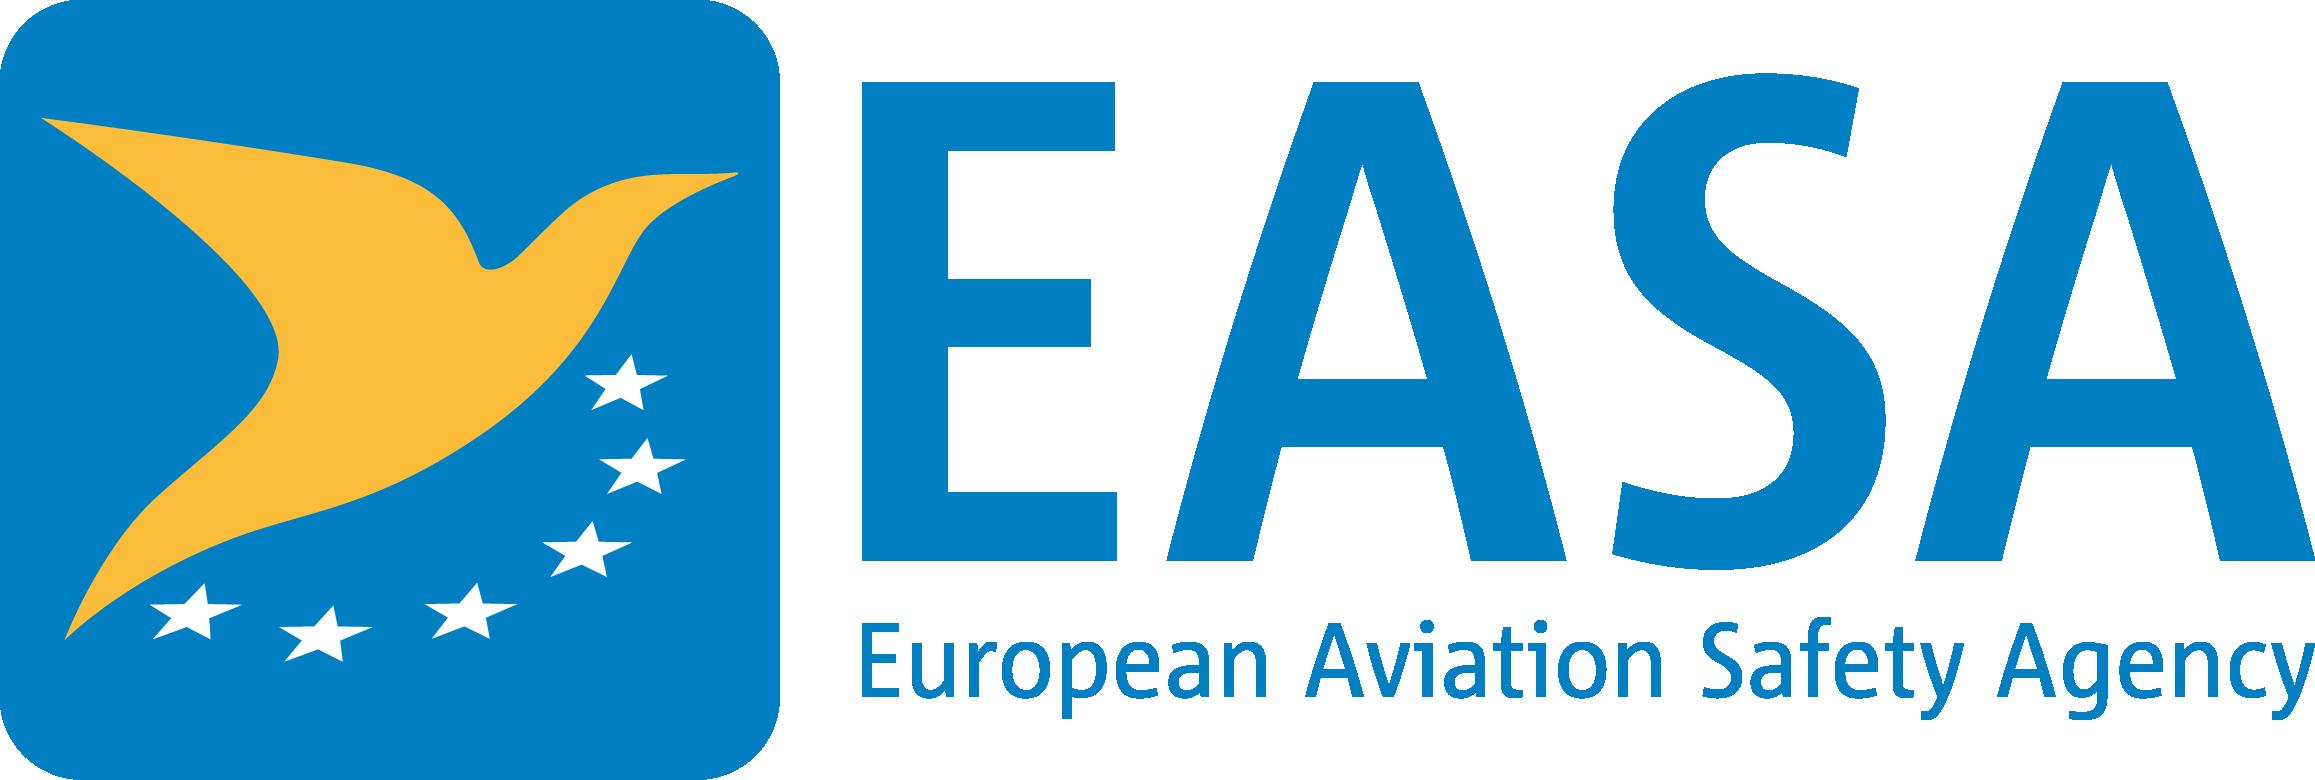 https://nextwavehellas.com/wp-content/uploads/2021/09/EASA_Logo.png